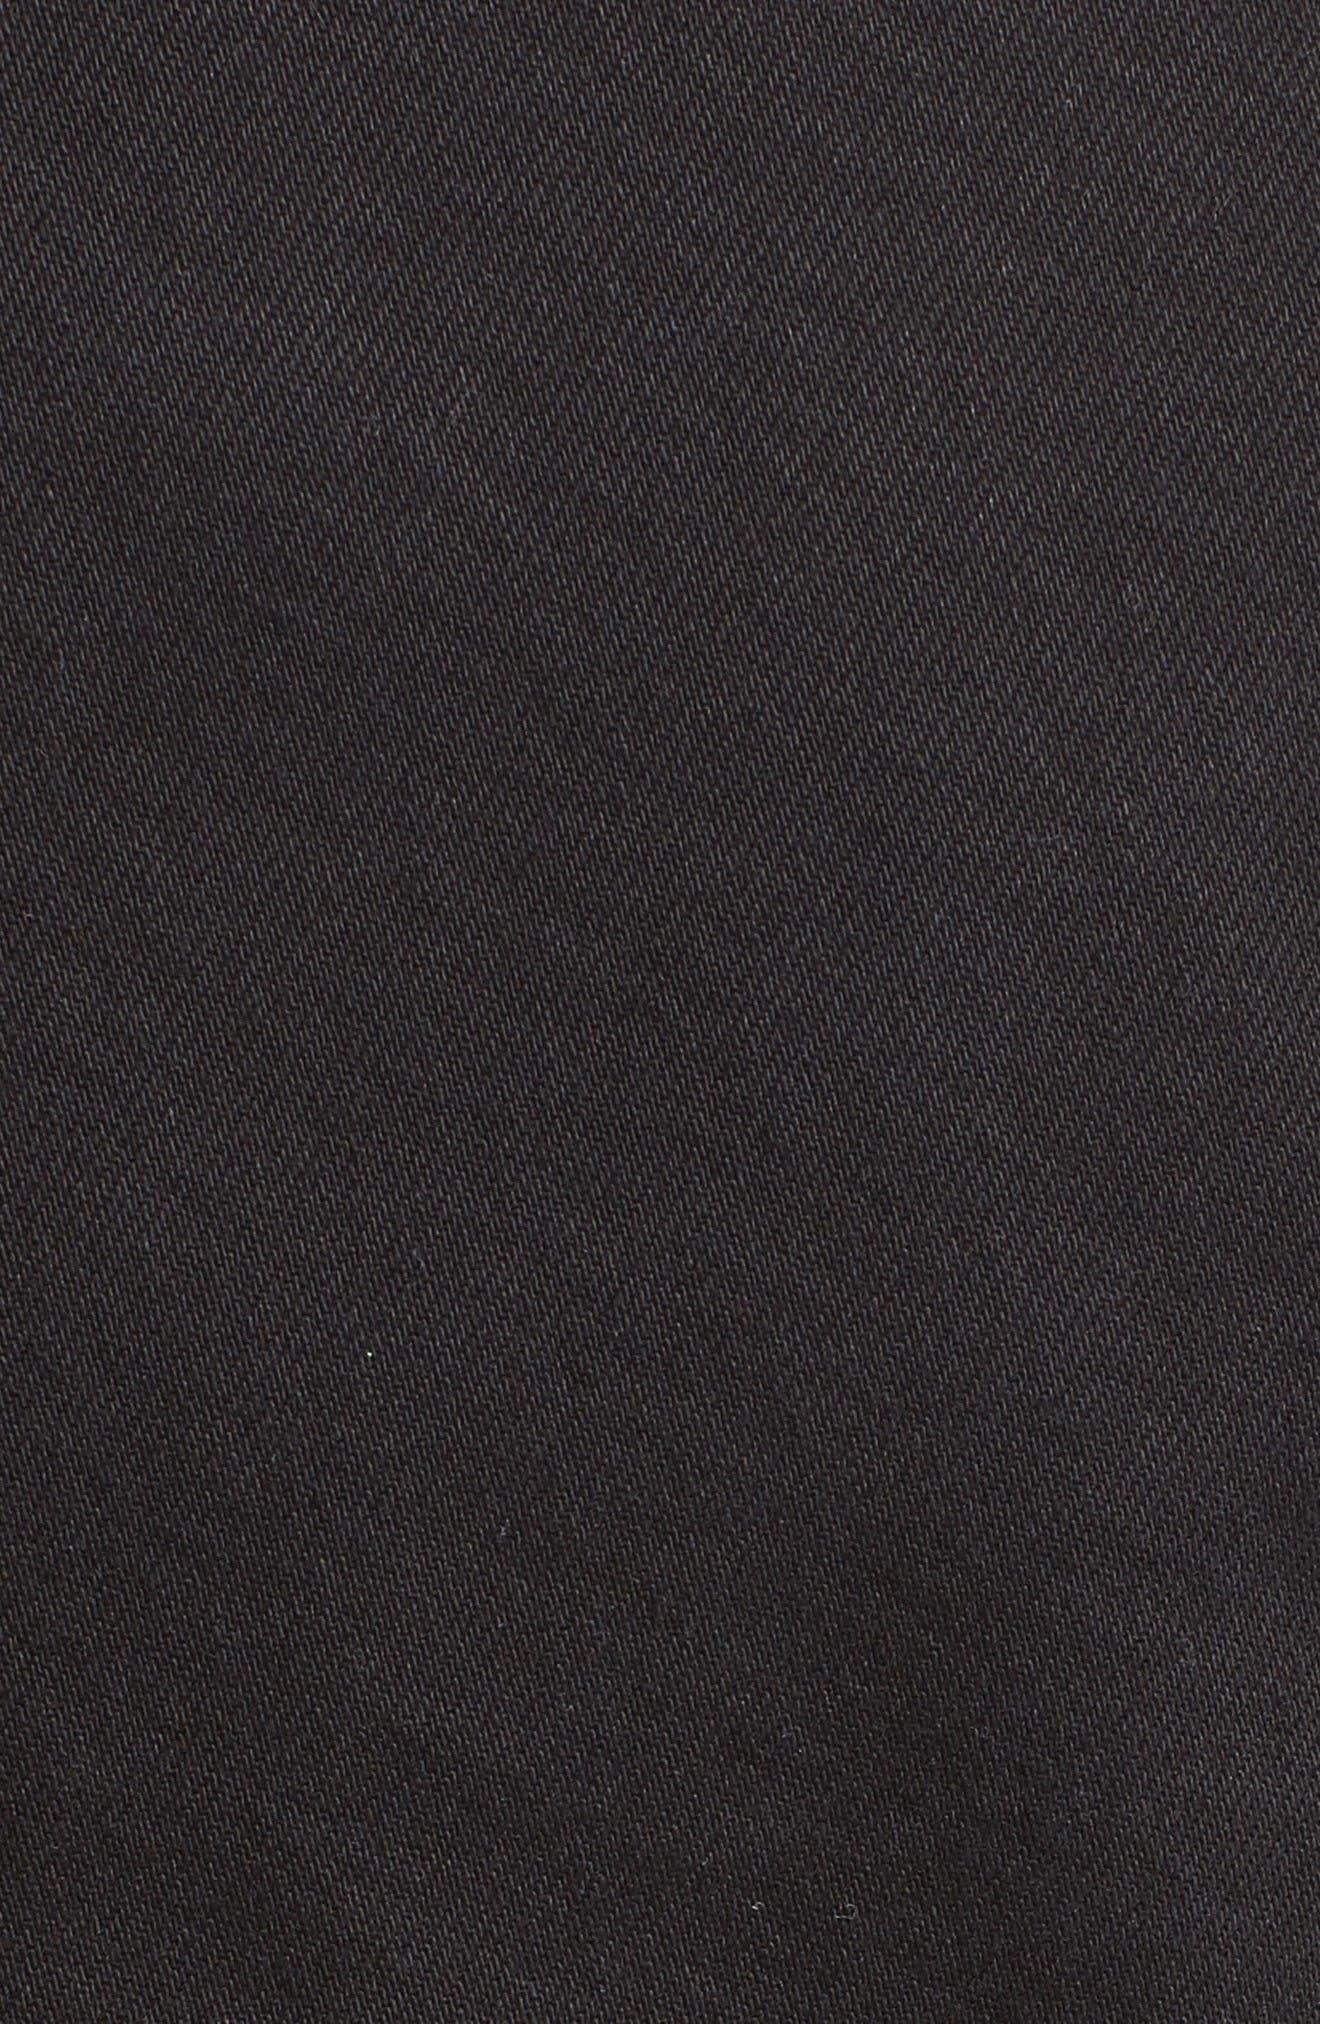 Alternate Image 3  - Alexander McQueen Peplum Denim Jacket